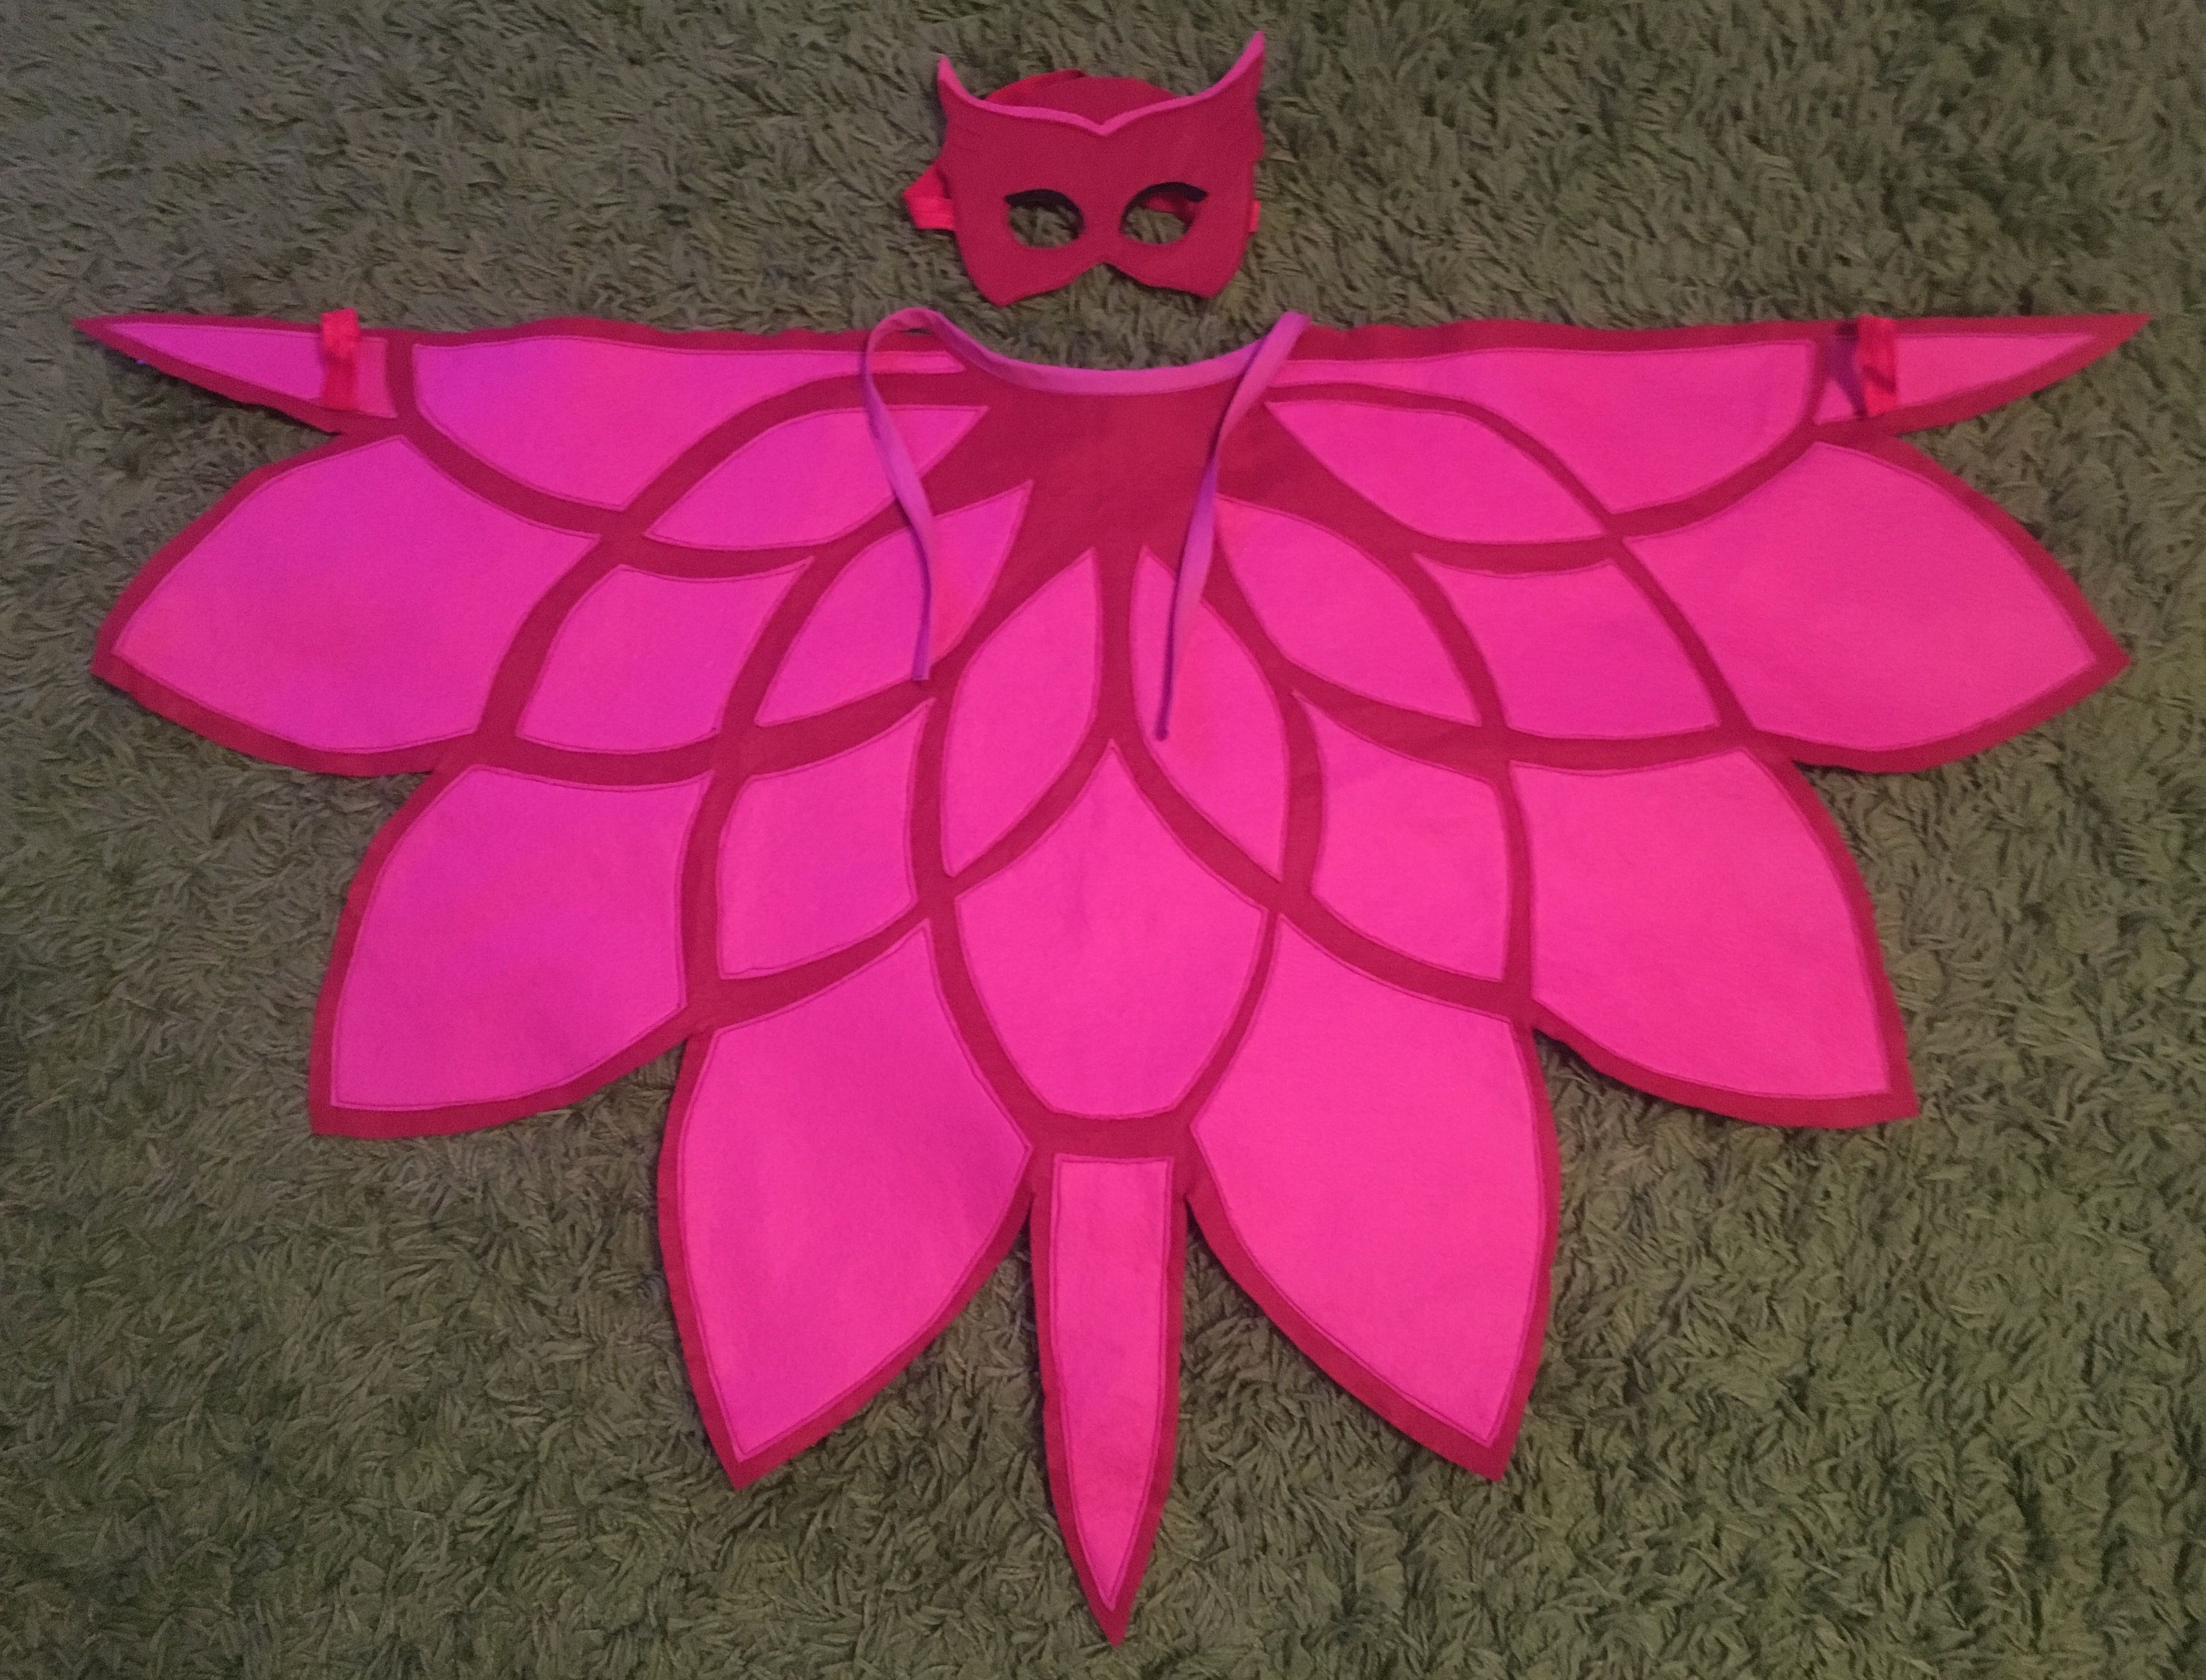 Pj masks owlette costume | Holiday | Pinterest | Kostüm